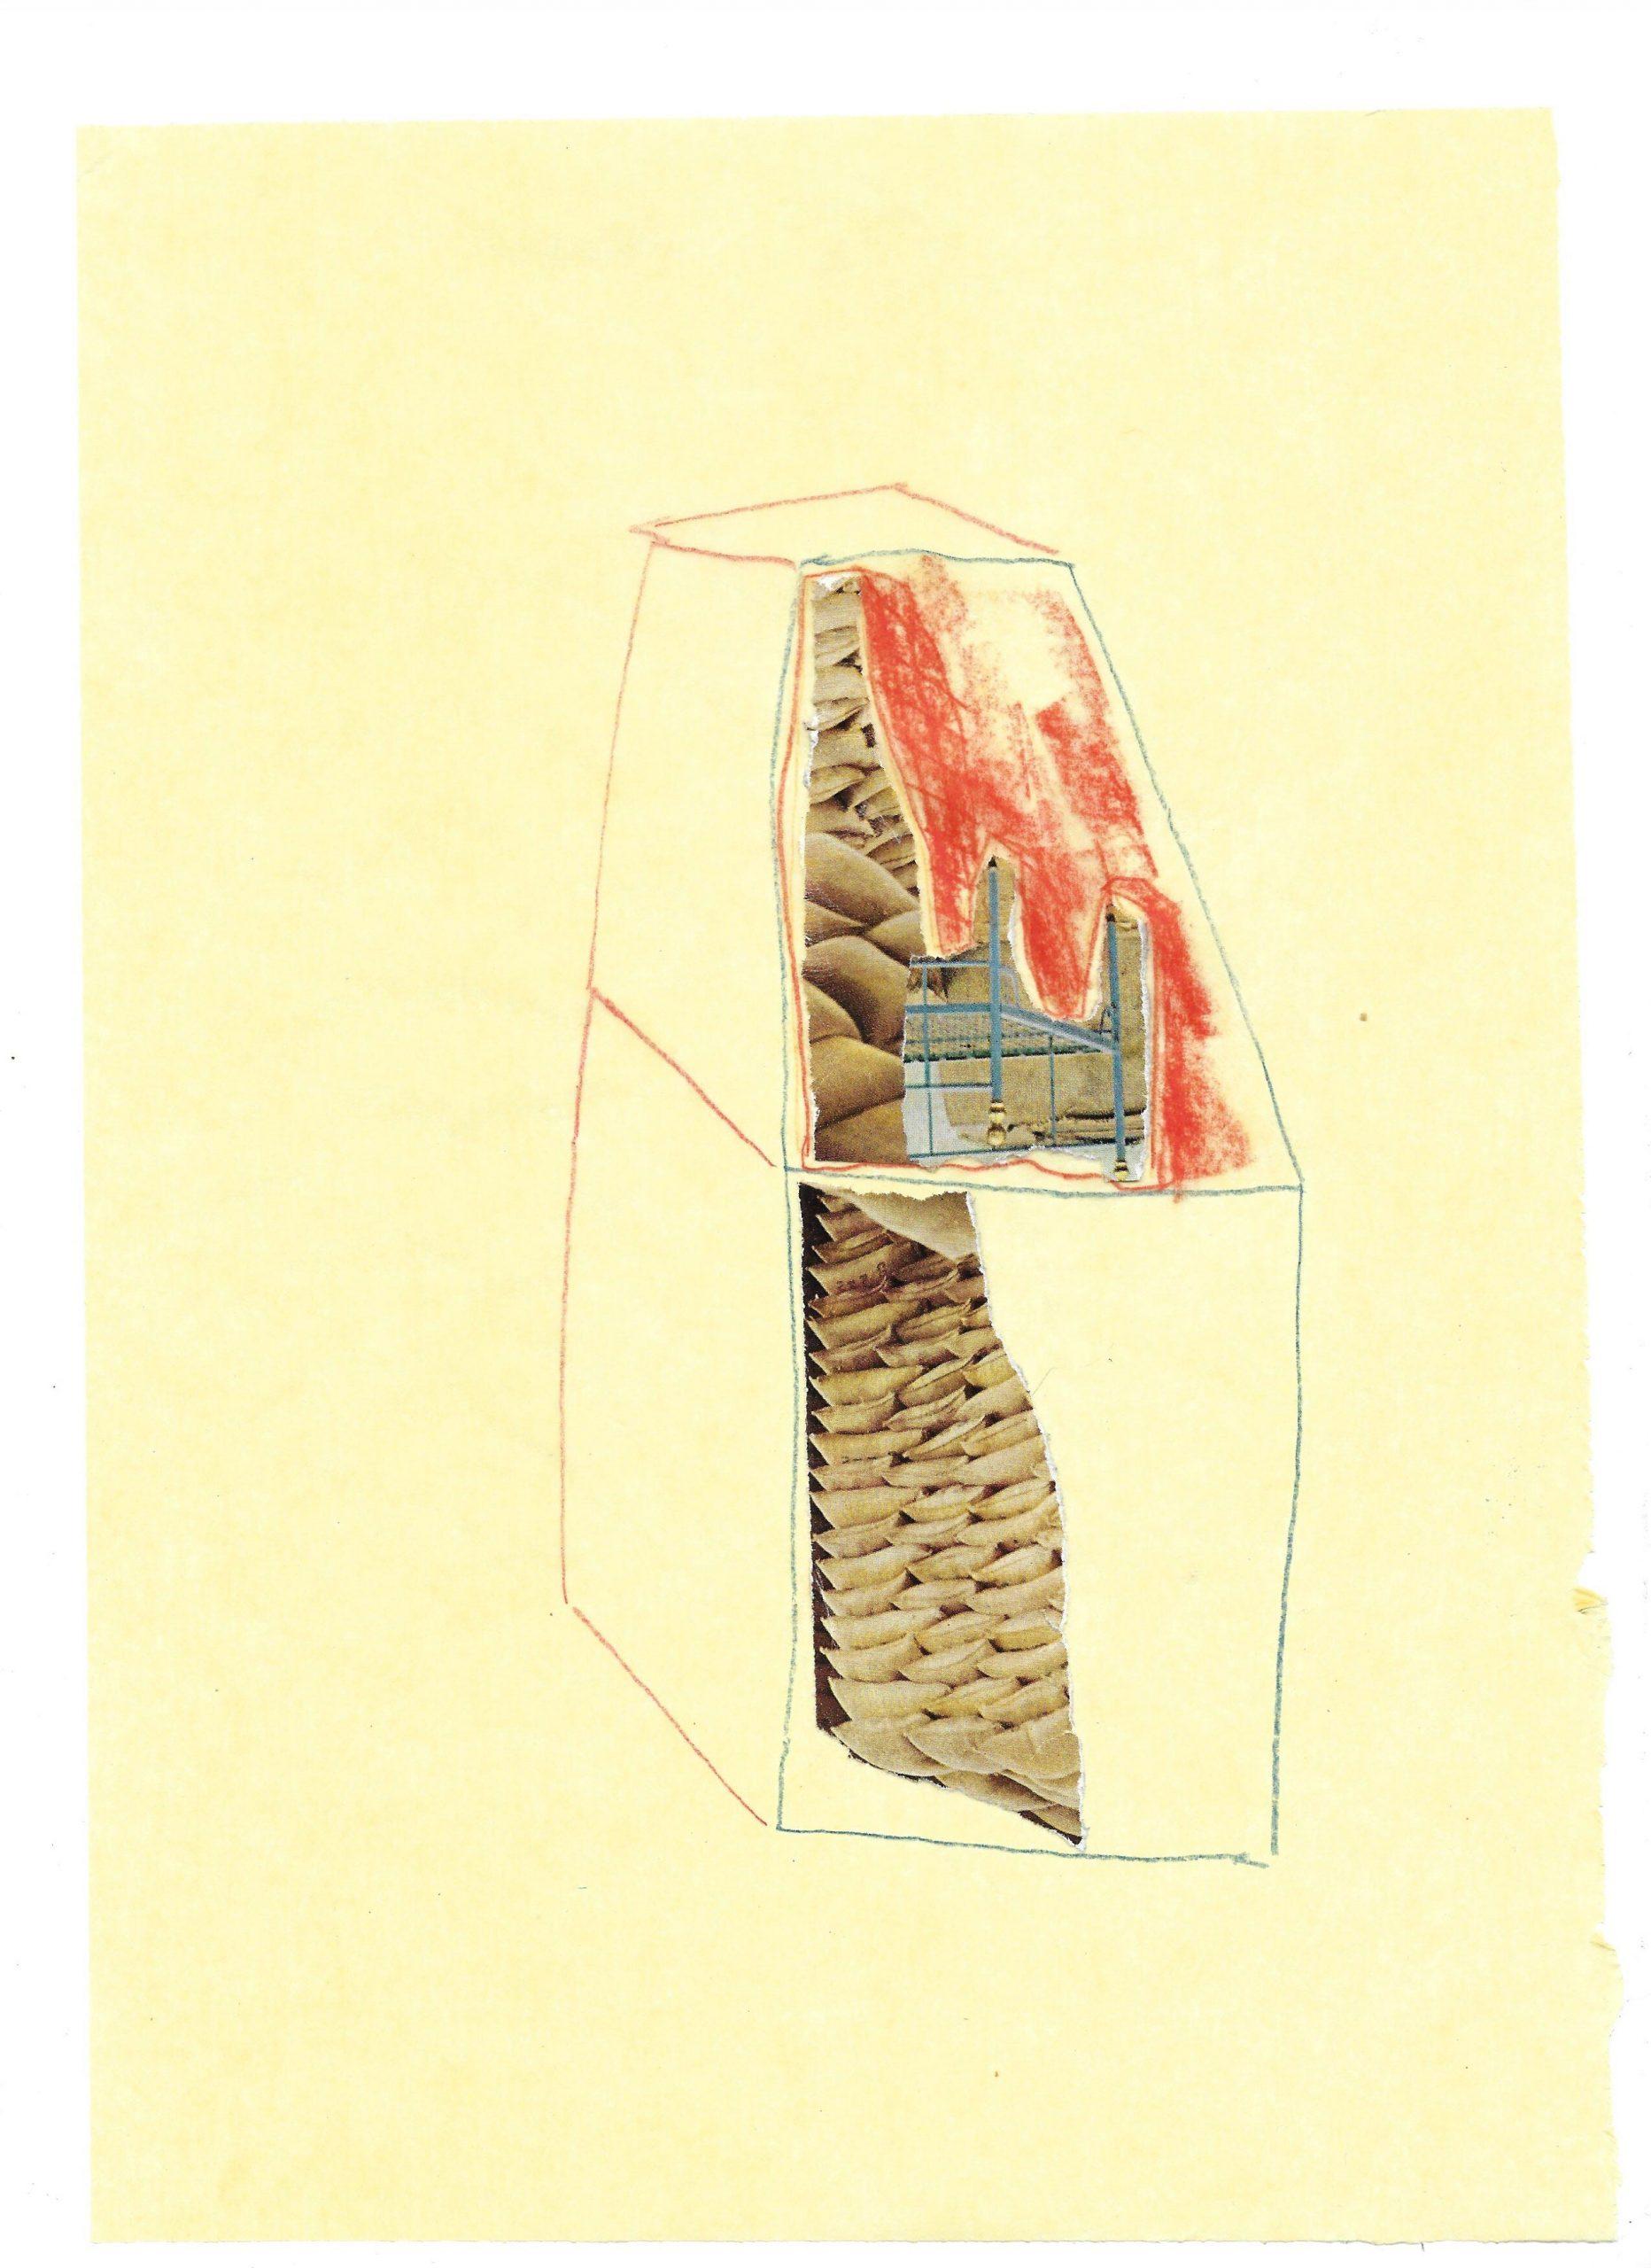 """Hut Study"" by Frances Erlandson (2020)"